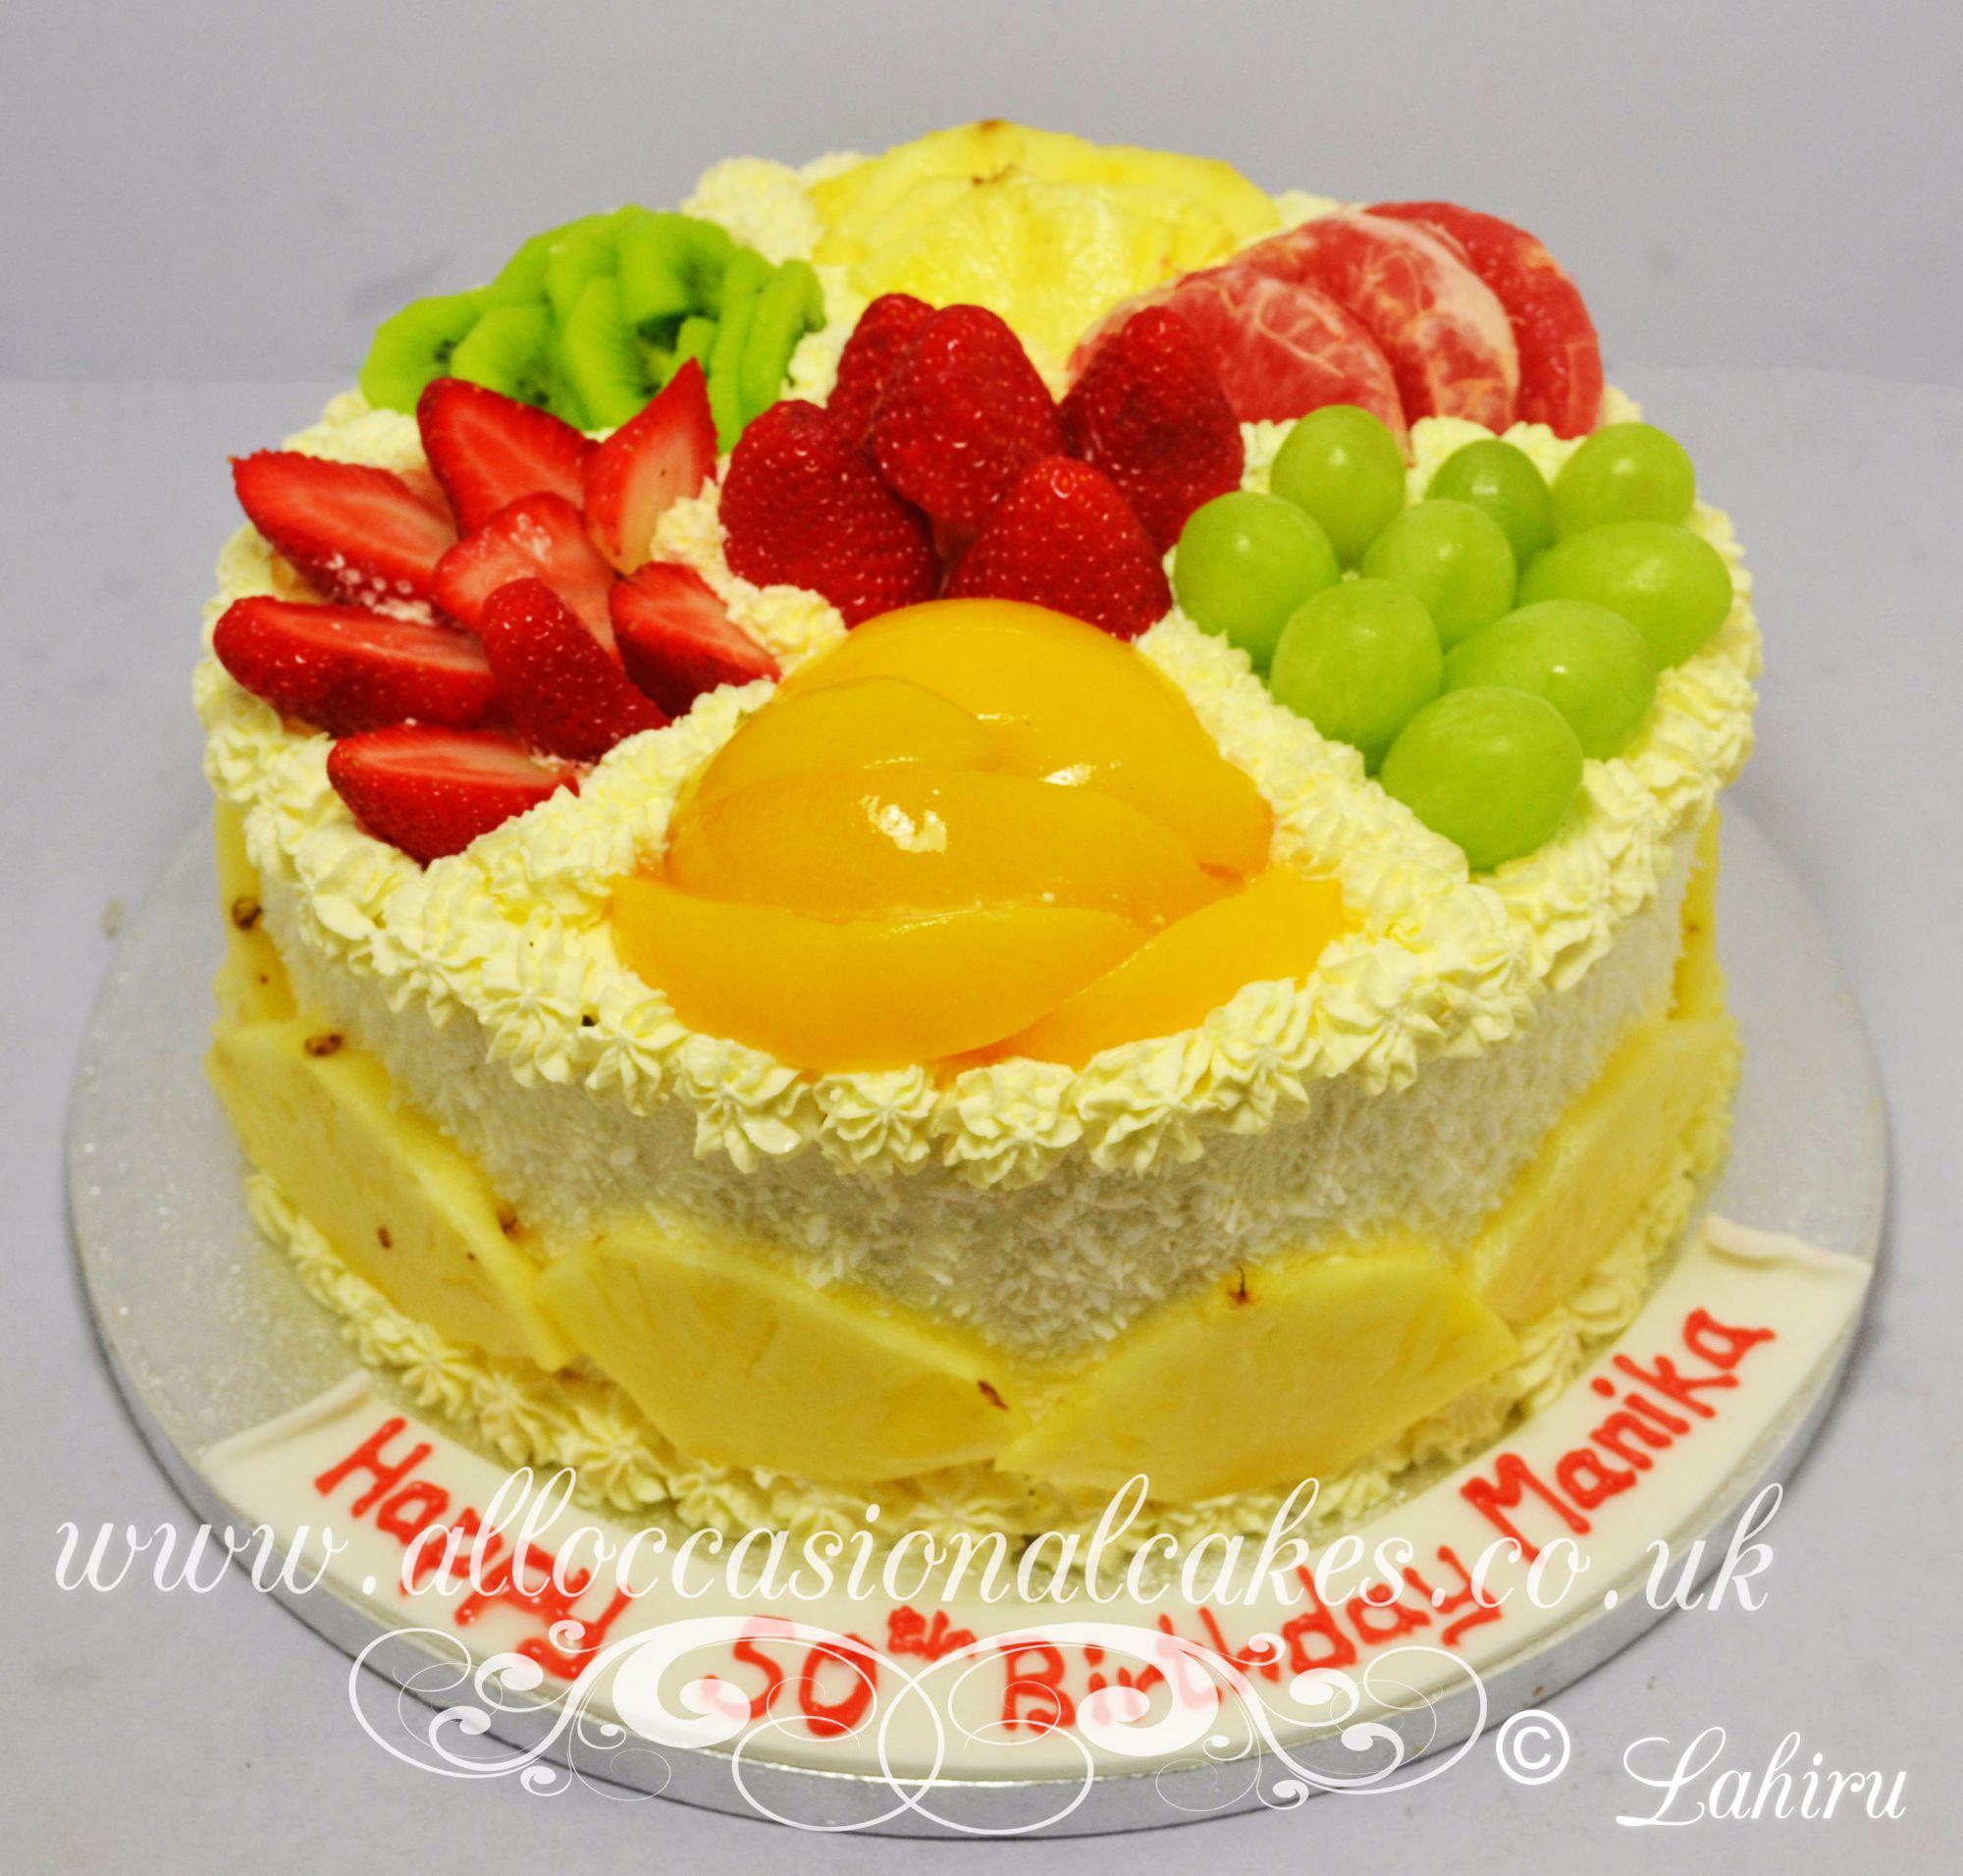 butter cream cake bristol